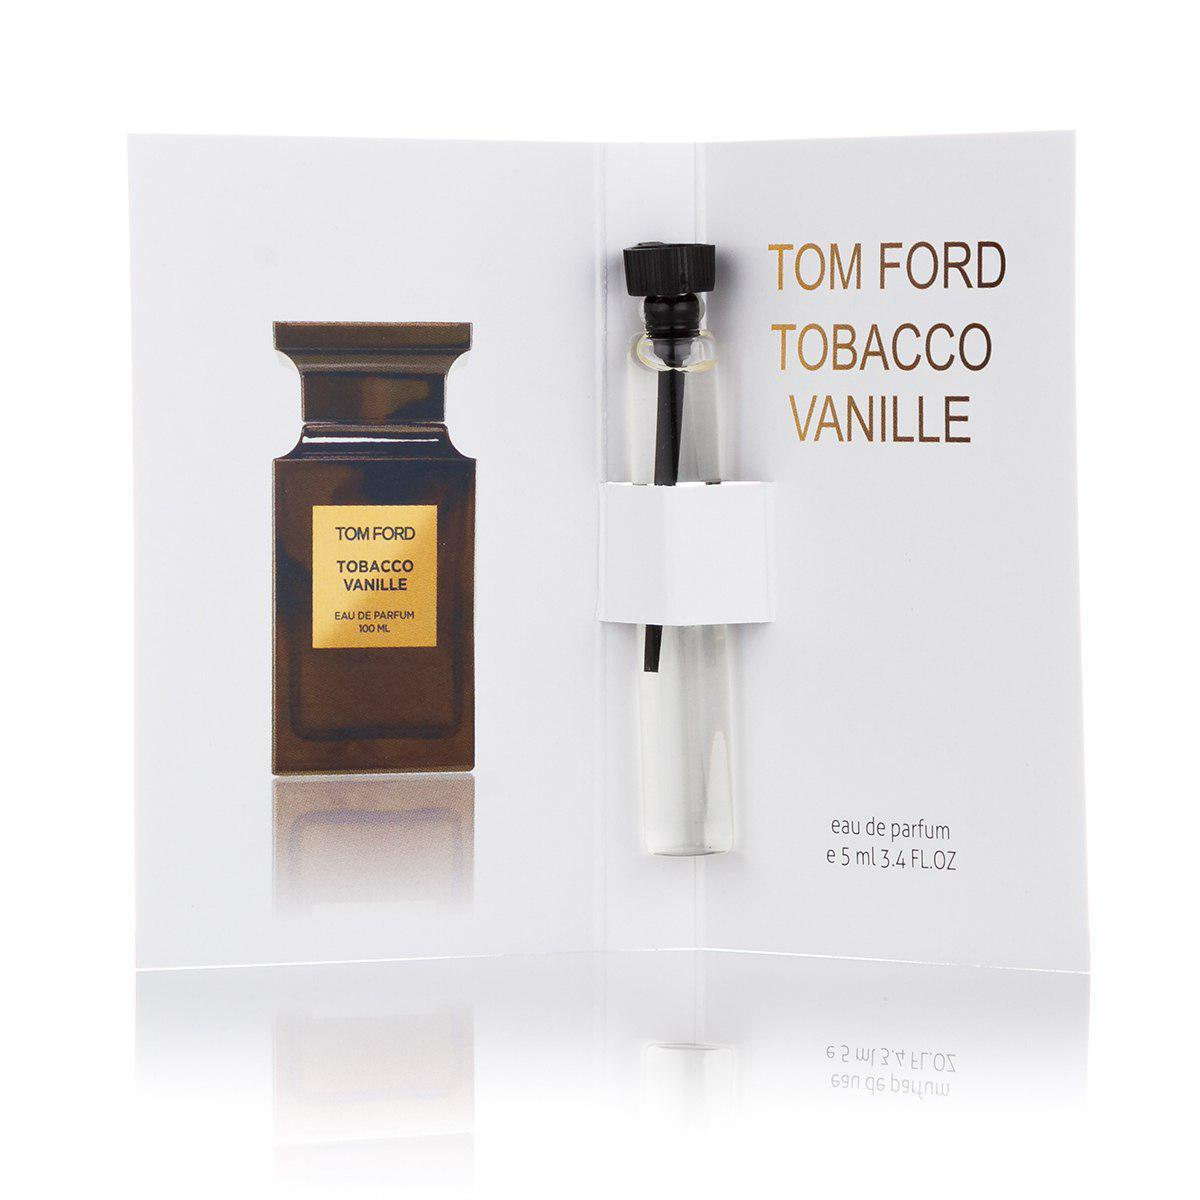 Tom Ford Tobacco Vanille парфюм унисекс тестер пробник 5 ml (реплика)